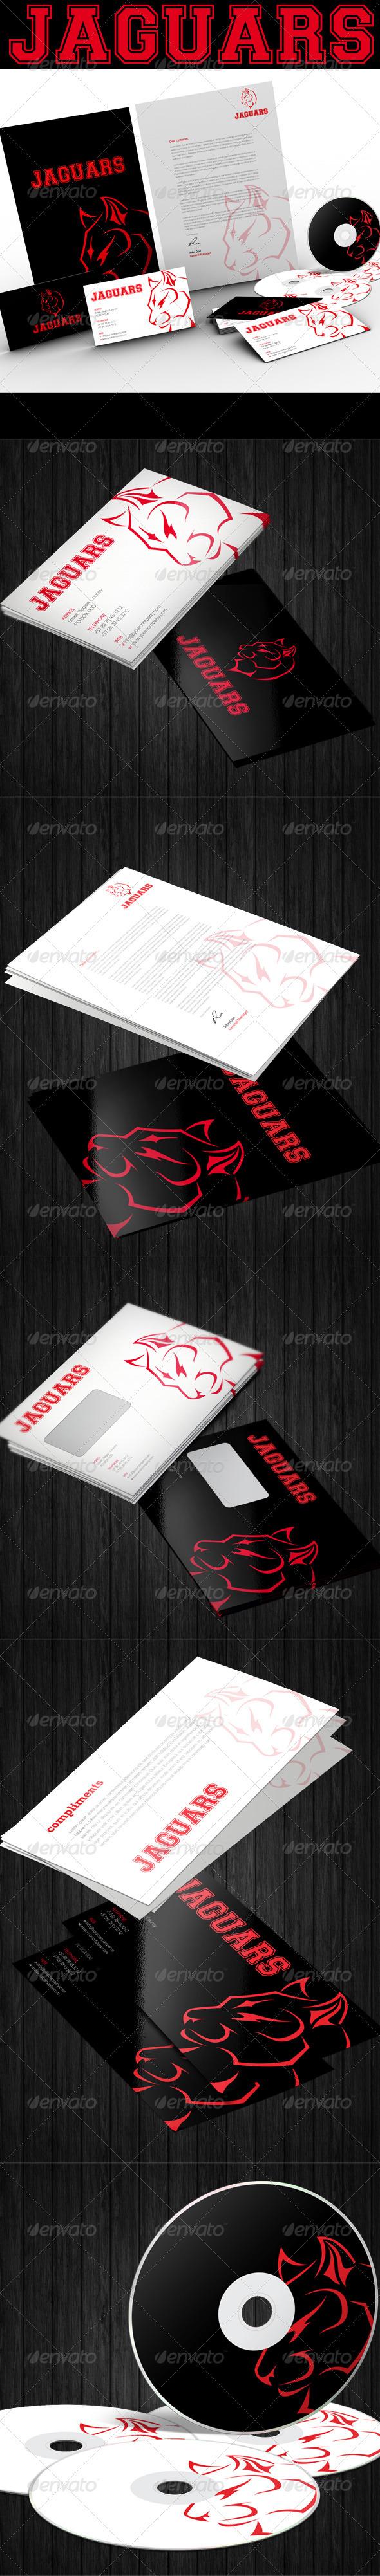 Jaguars Corporate Identity - Stationery Print Templates